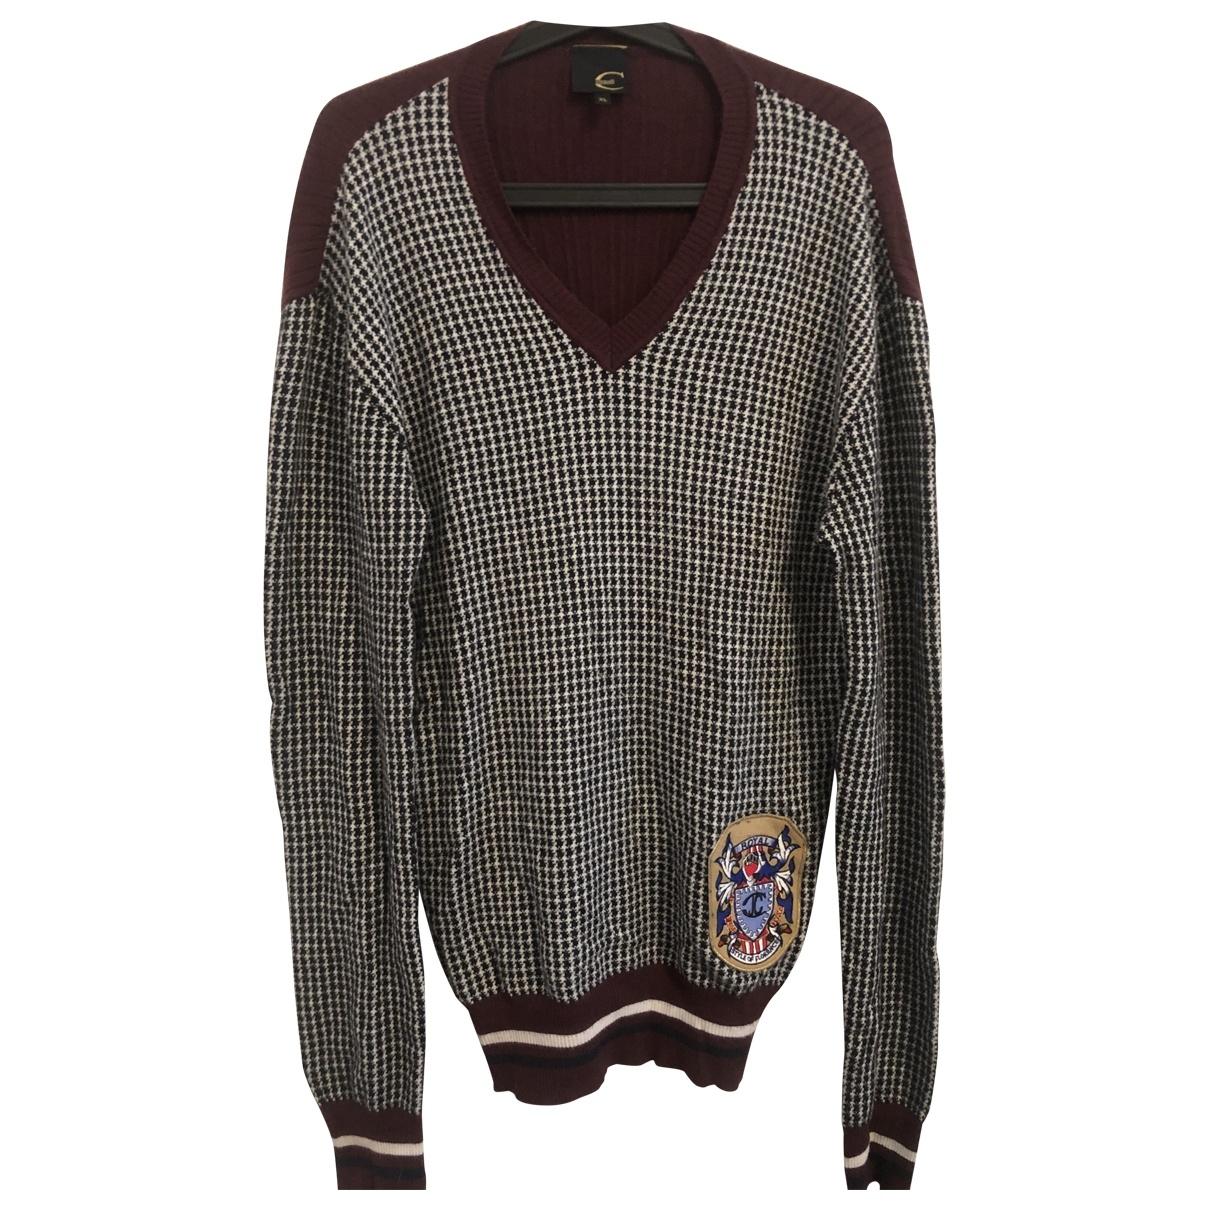 Just Cavalli \N Burgundy Knitwear & Sweatshirts for Men XL International